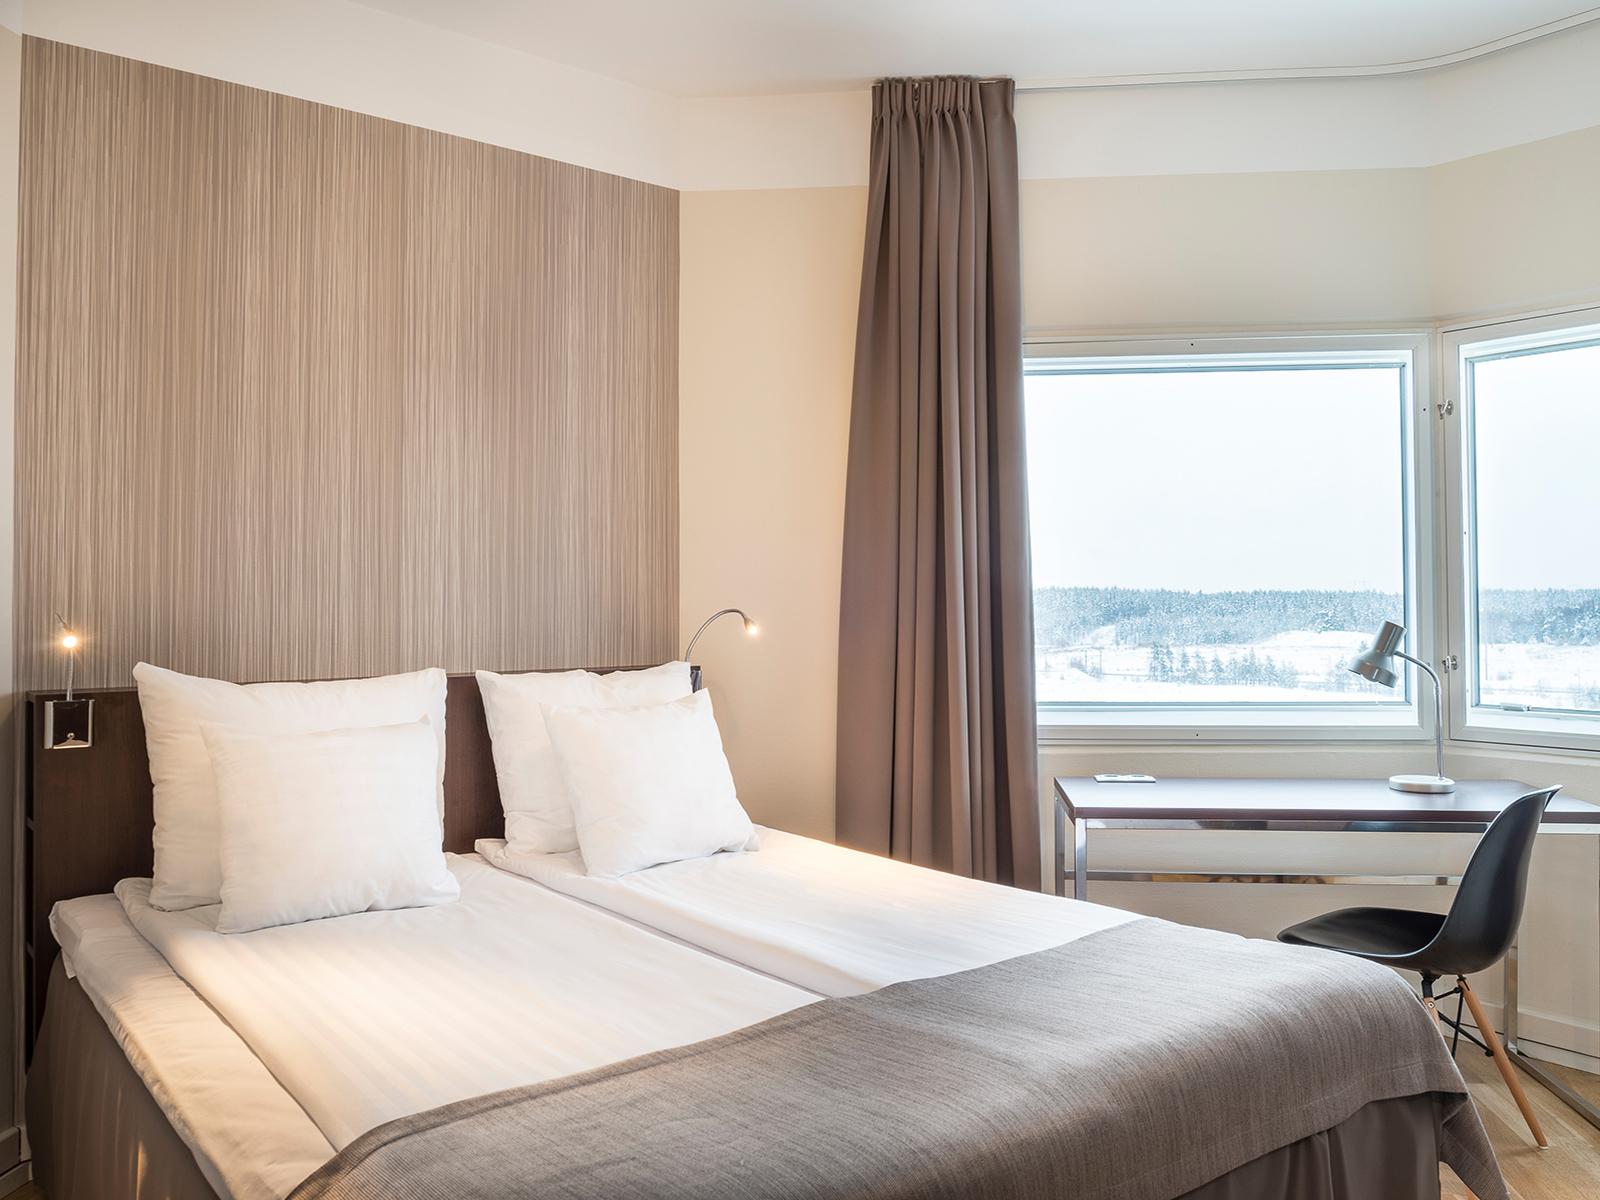 spa hotell arlanda